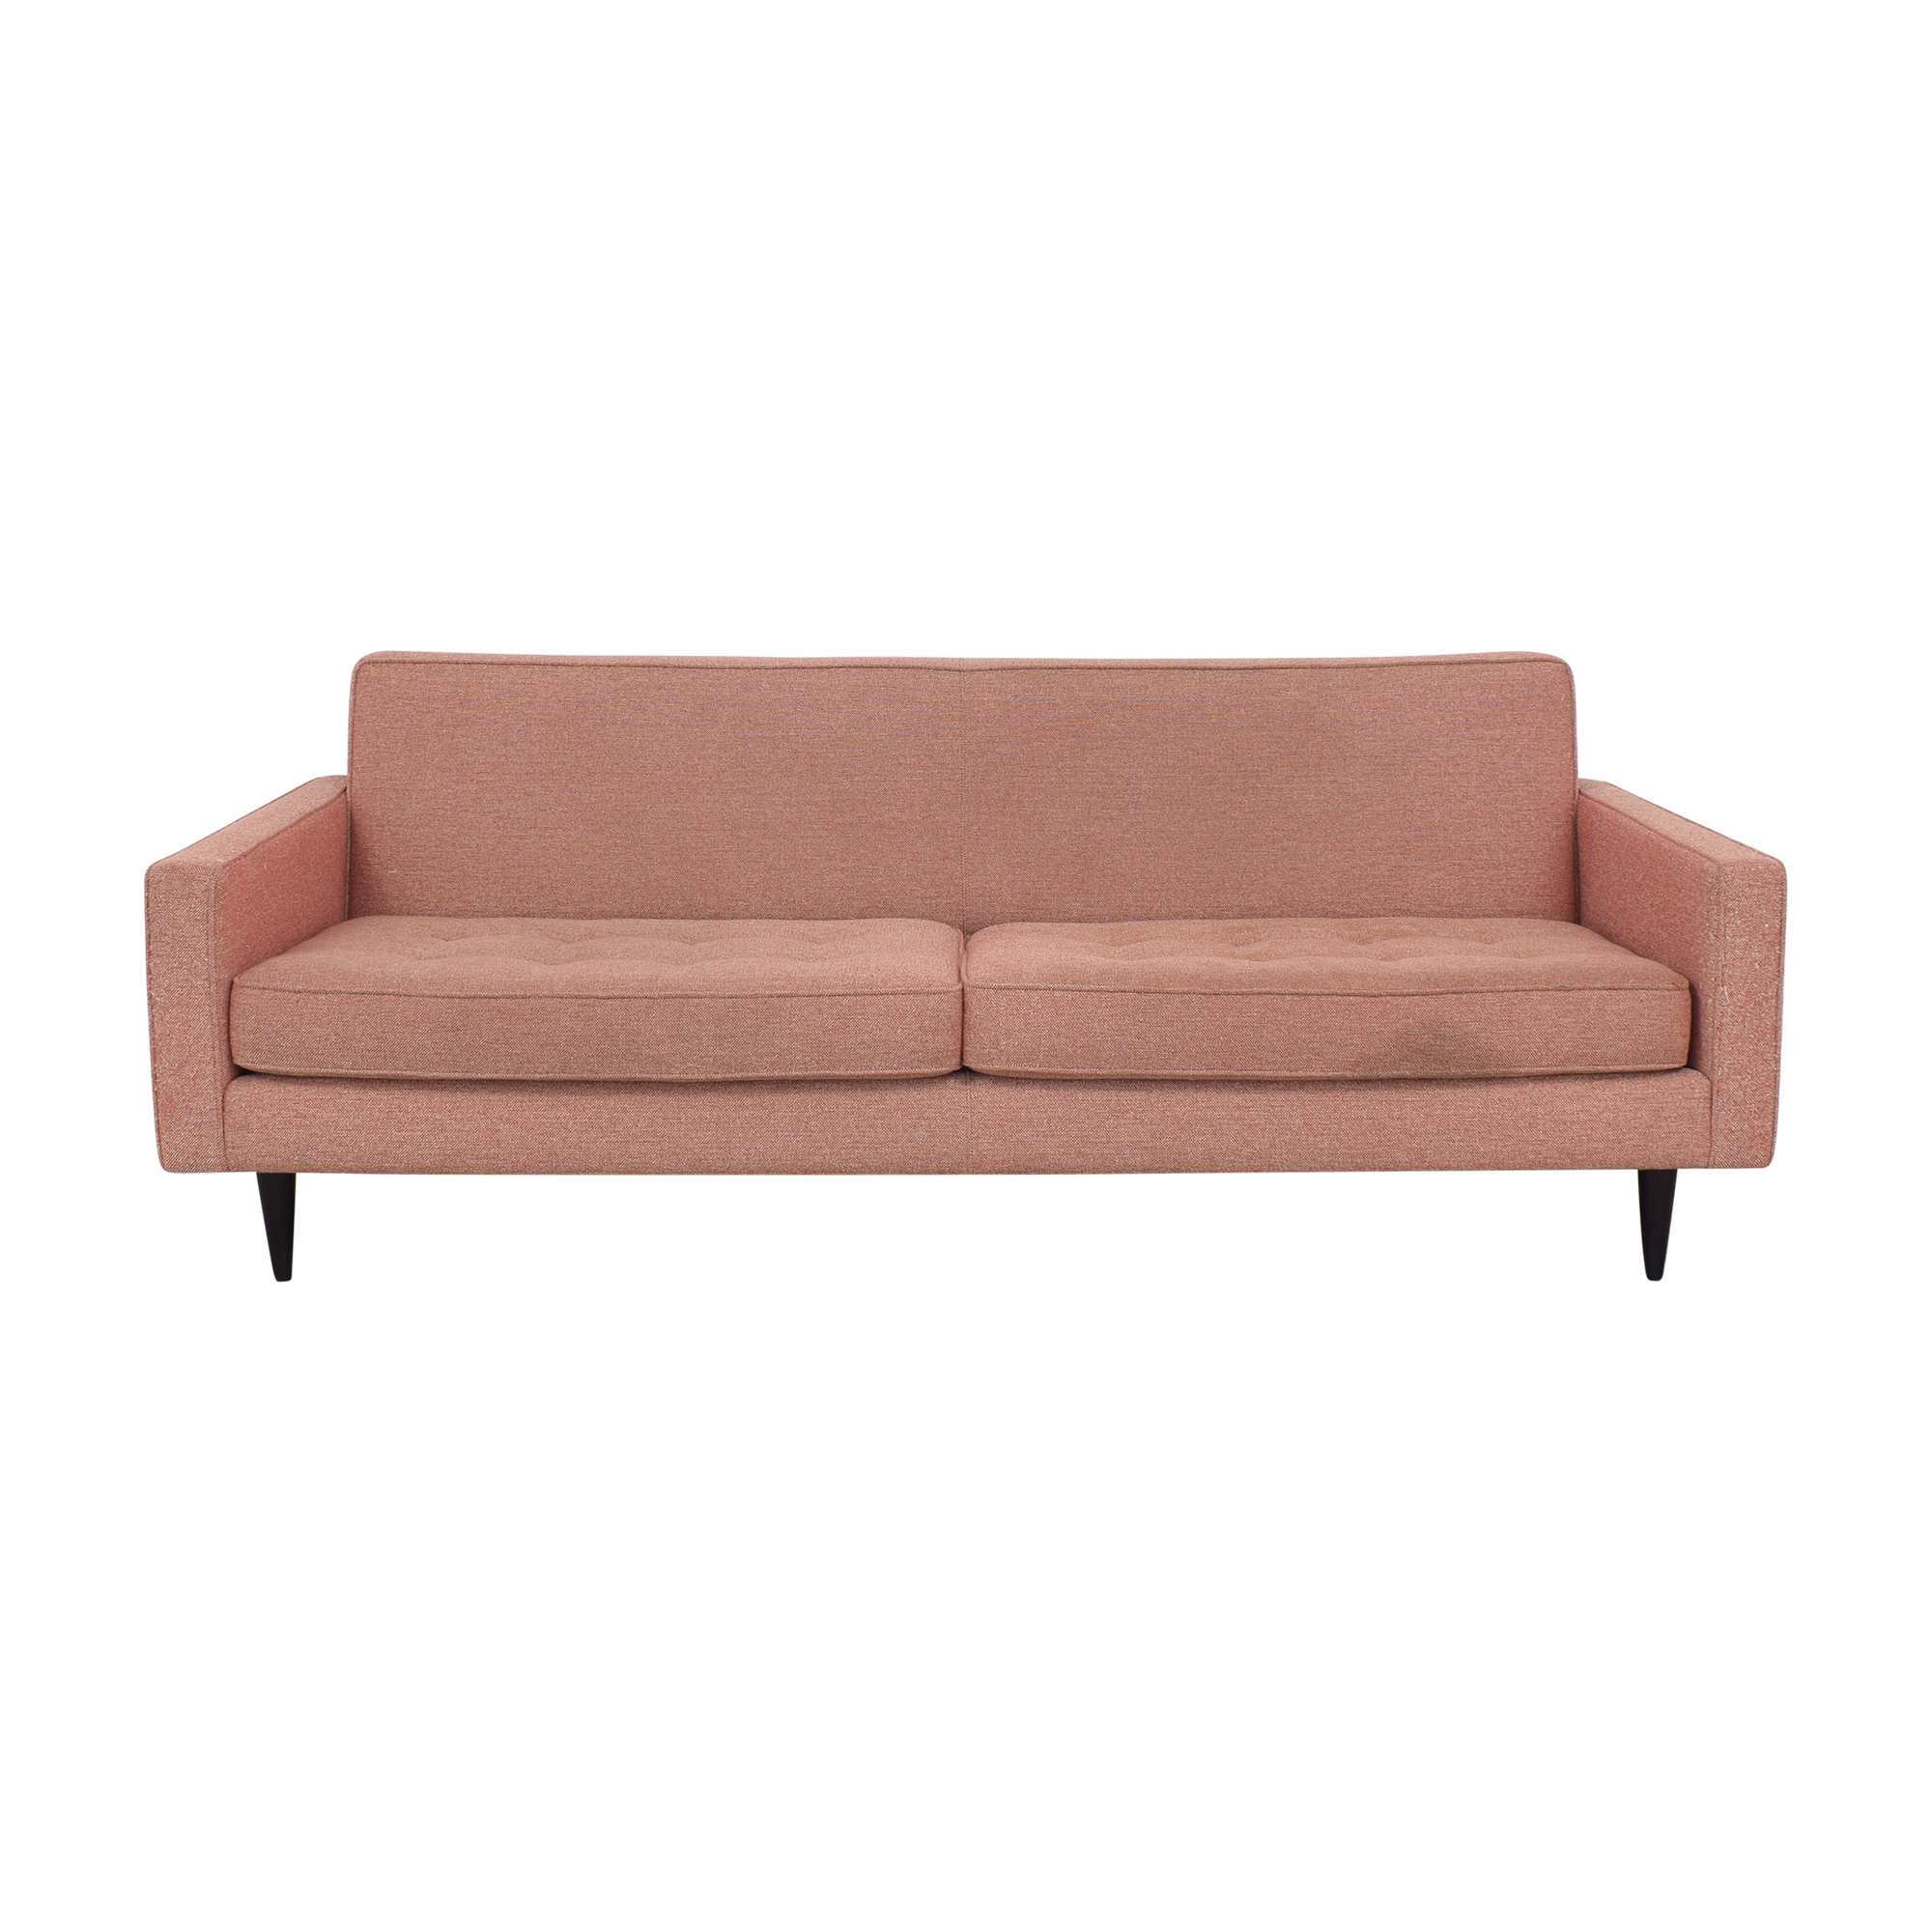 Room & Board Room & Board Reese Sofa Classic Sofas